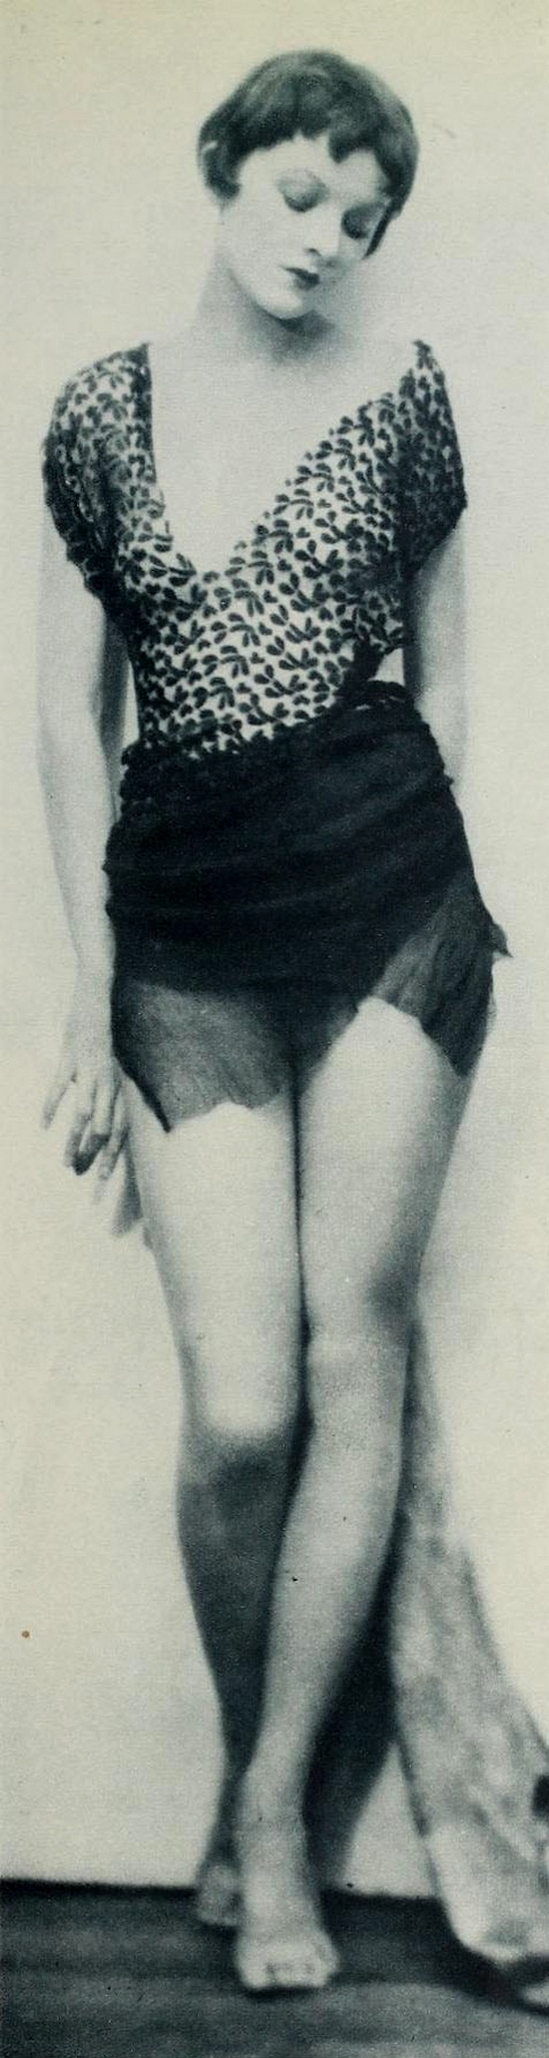 Henri Waxman. L'actrice Myrna Loy 1920. Via diasp.org.jpg